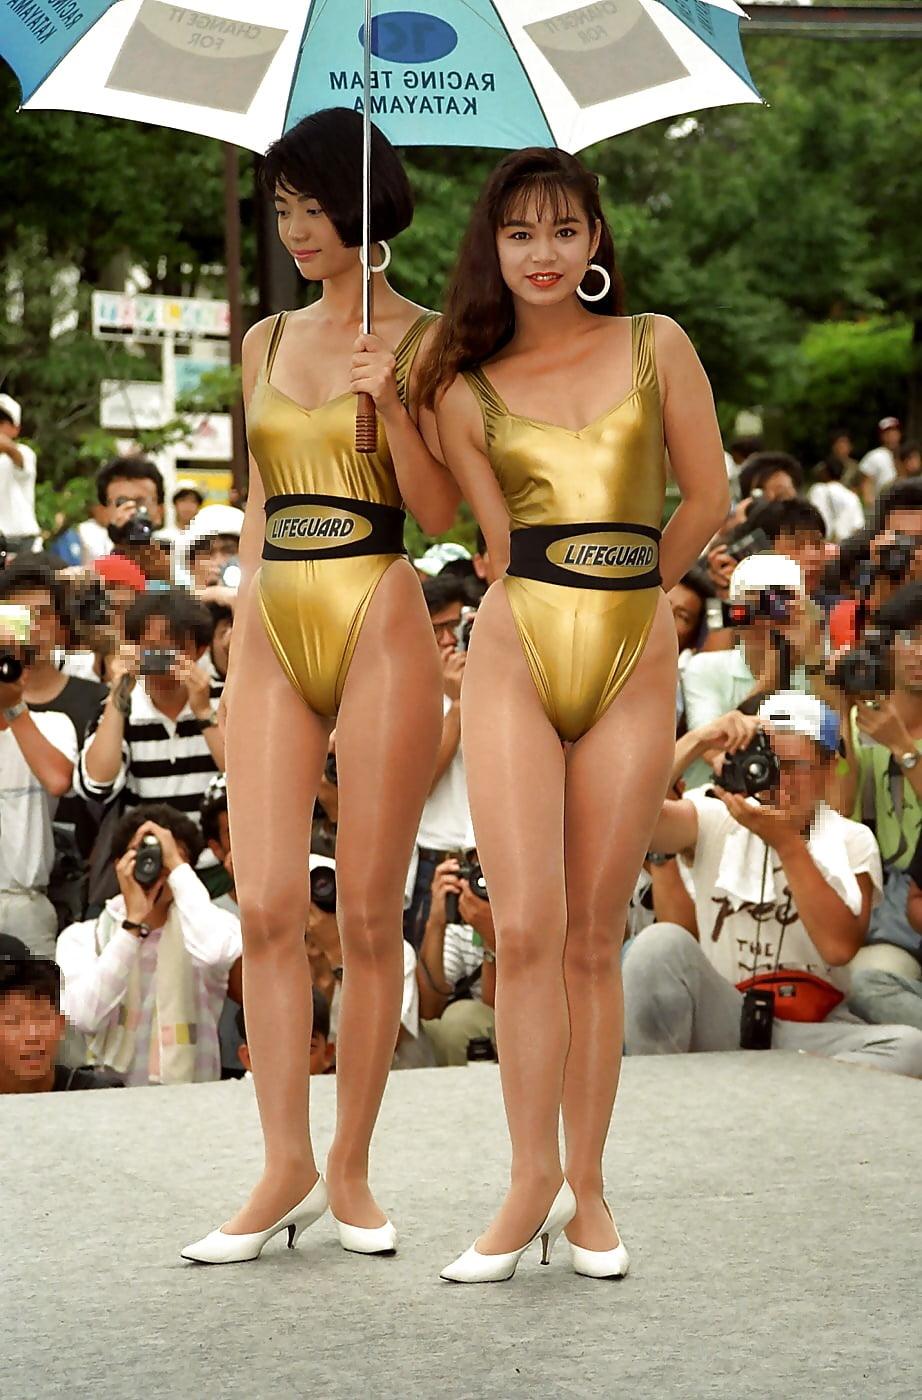 Japanese race queen benetton - 4 3